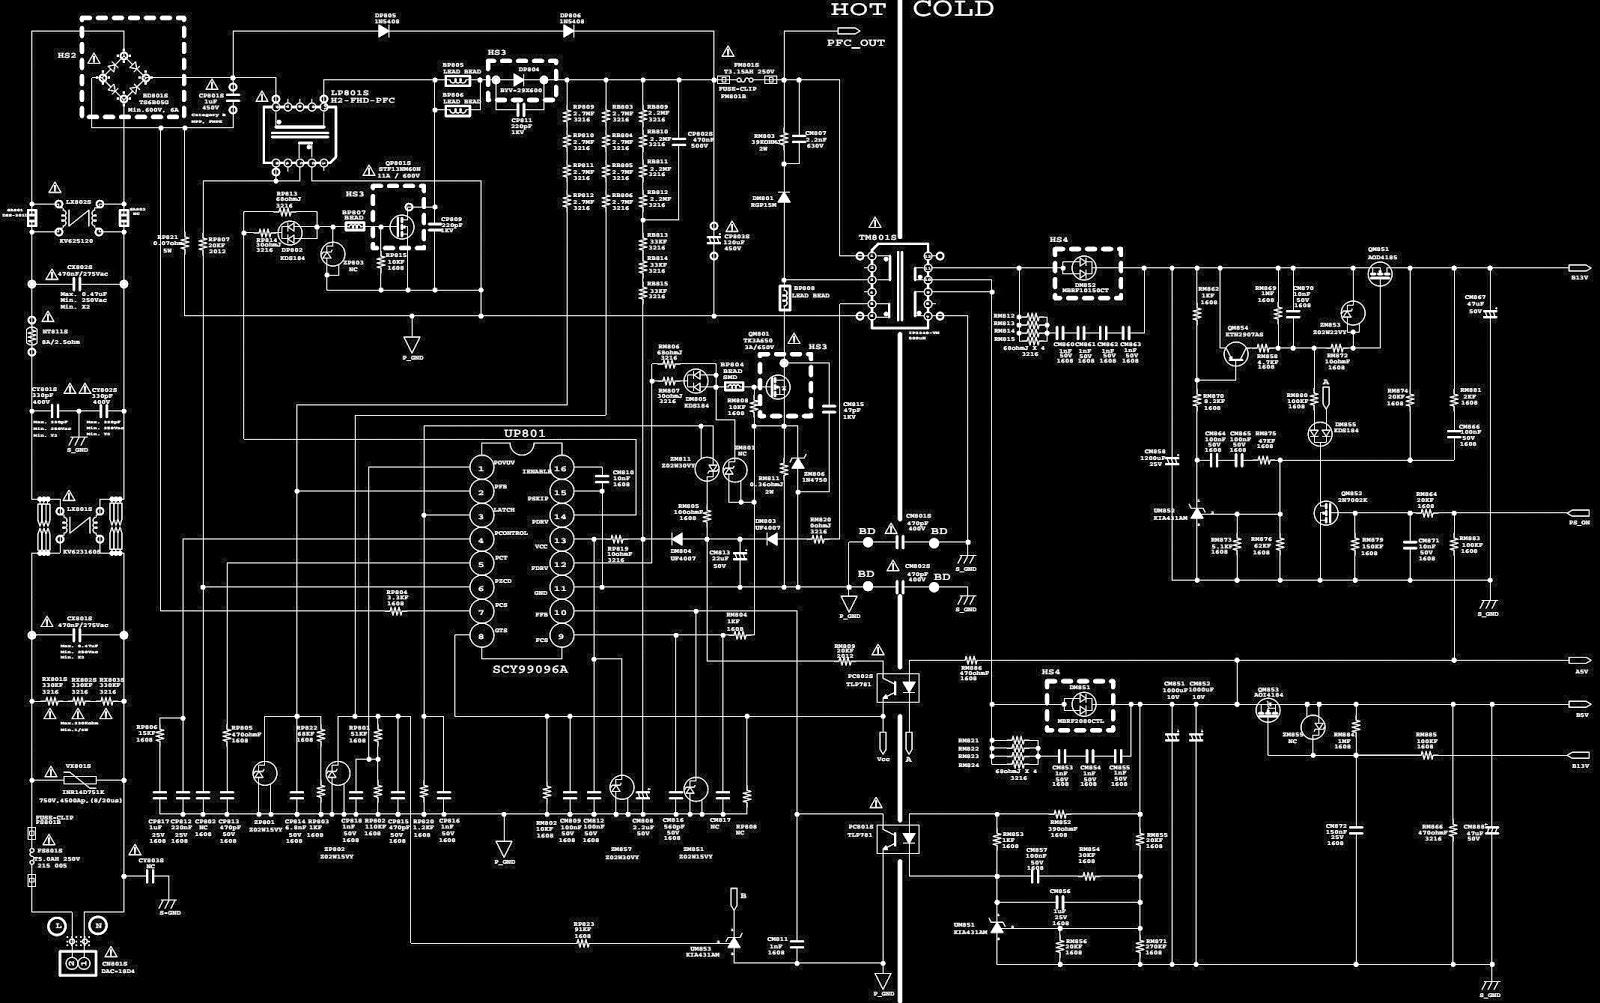 samsung bn44-00439a - smps schematic